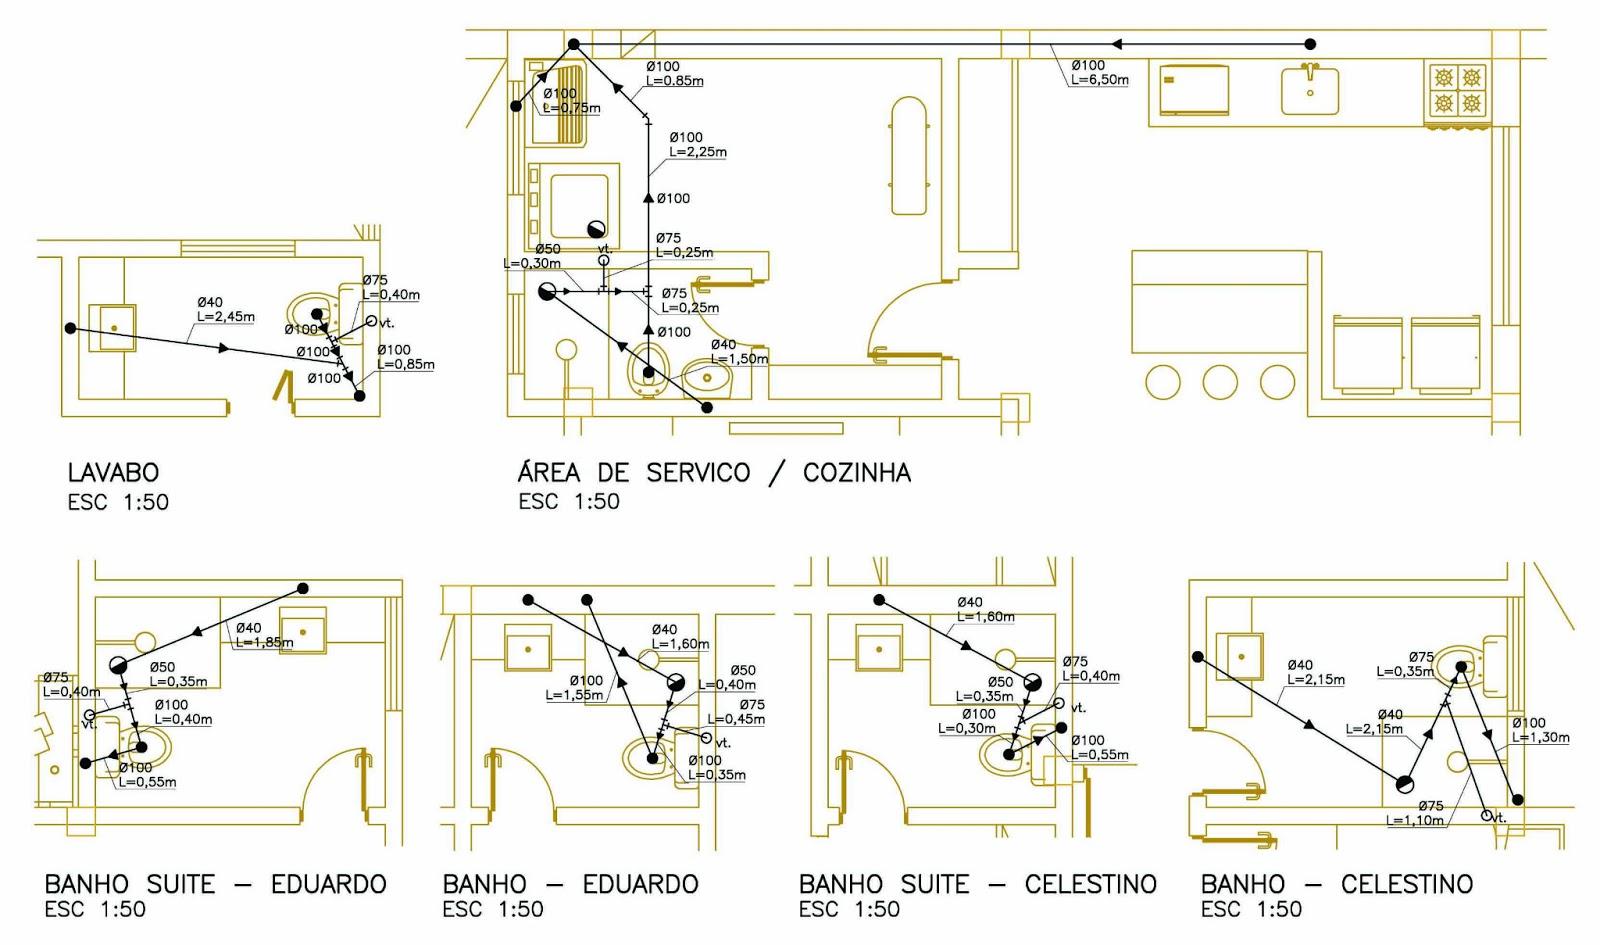 MARIANA PROJETISTA: Arquitetura #01: Ergonomia > Acessibilidade #978434 1600 945